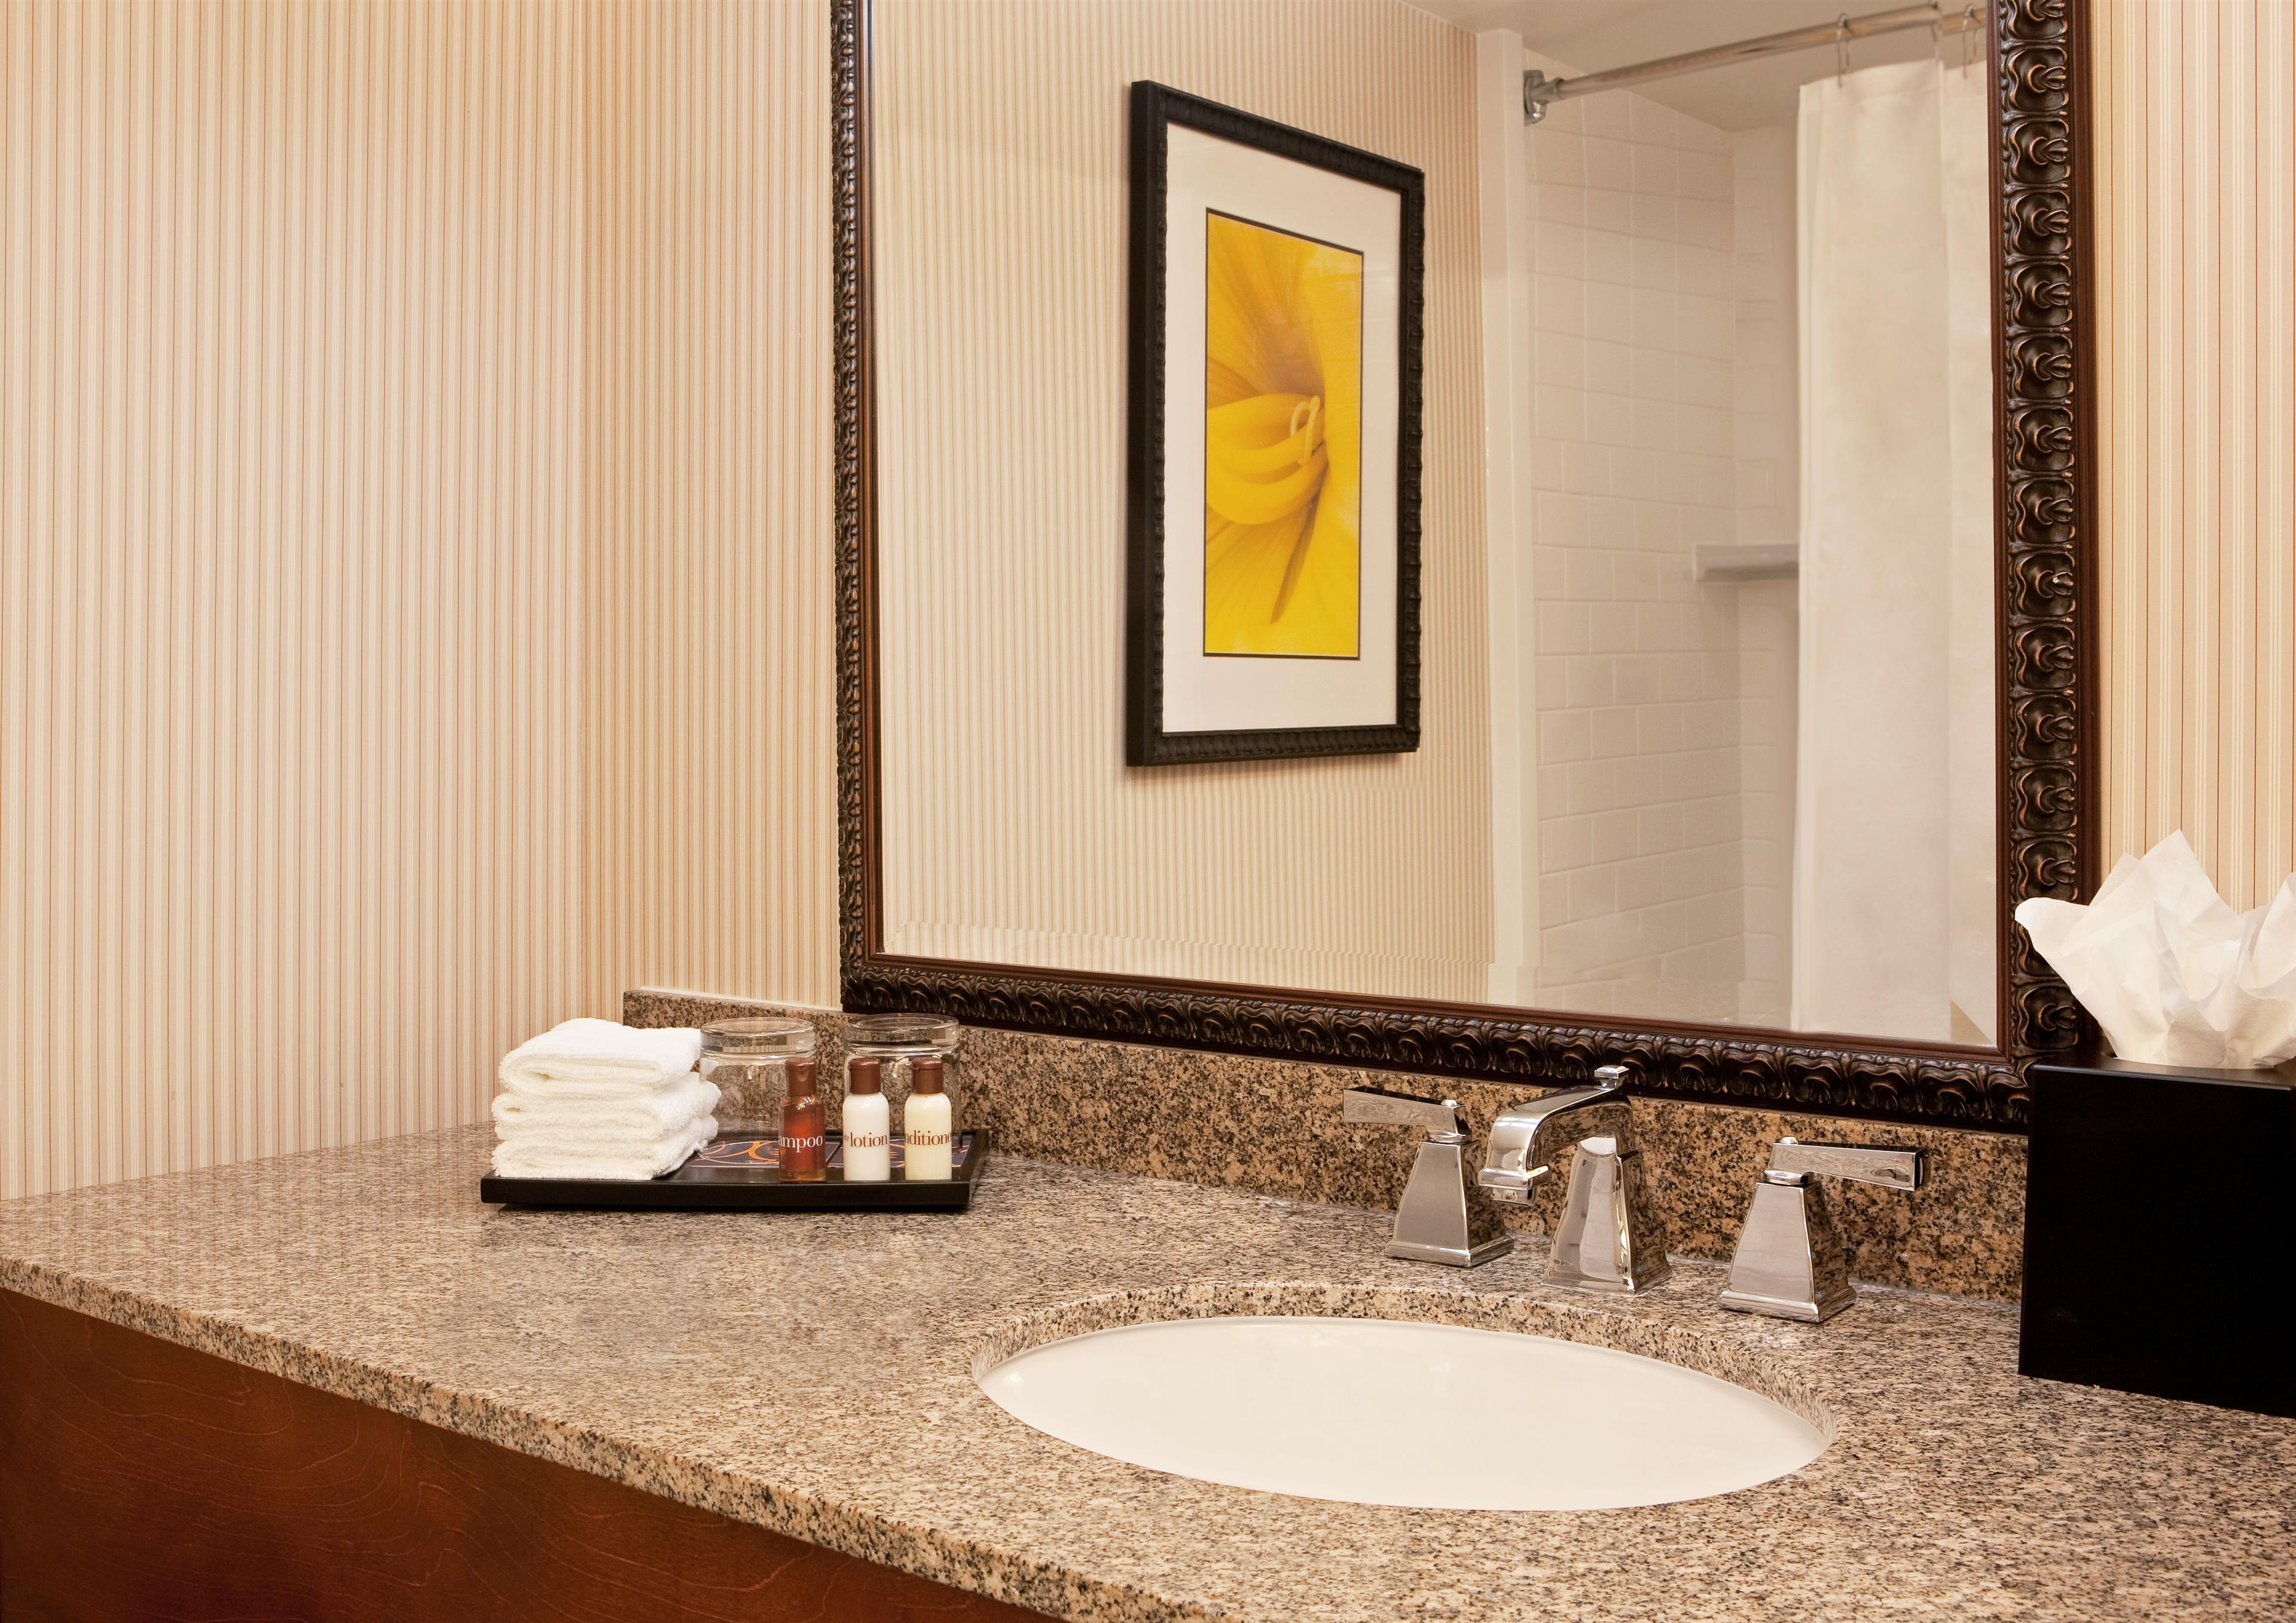 Sheraton Atlanta Airport Hotel image 8